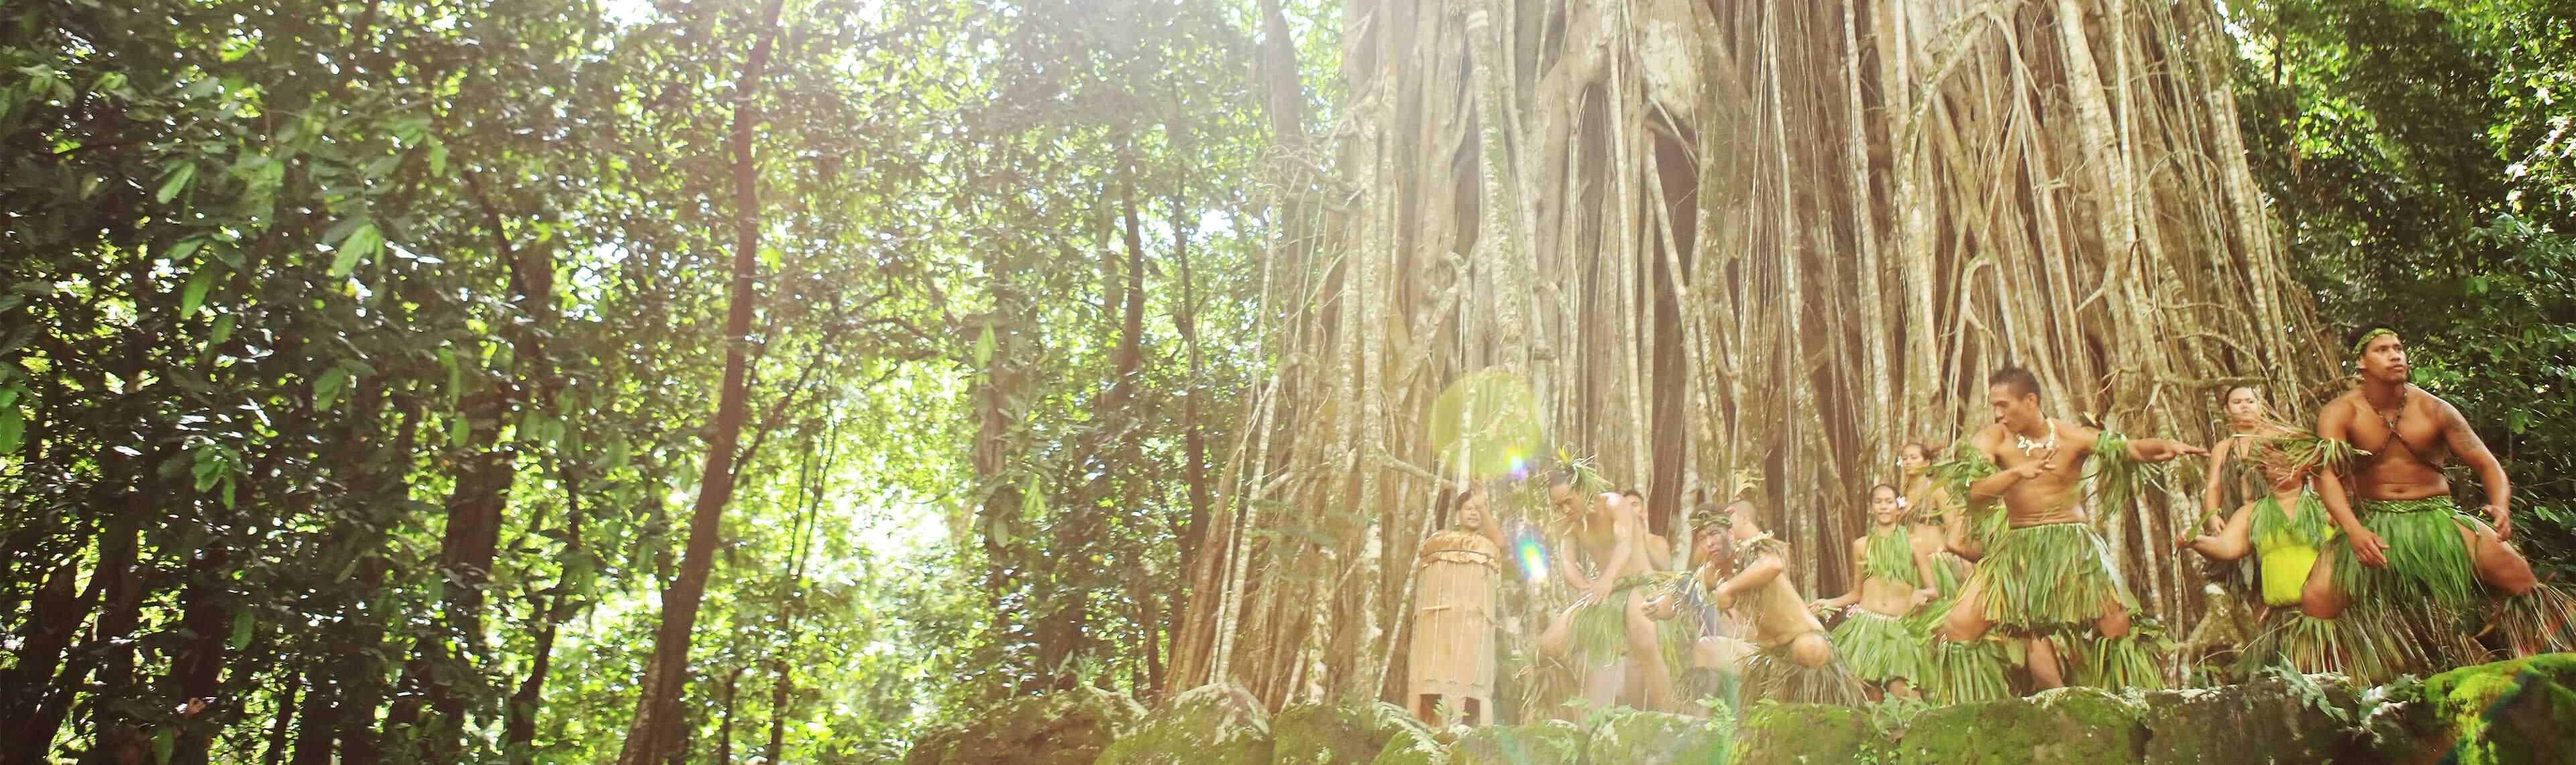 Tahitian culture